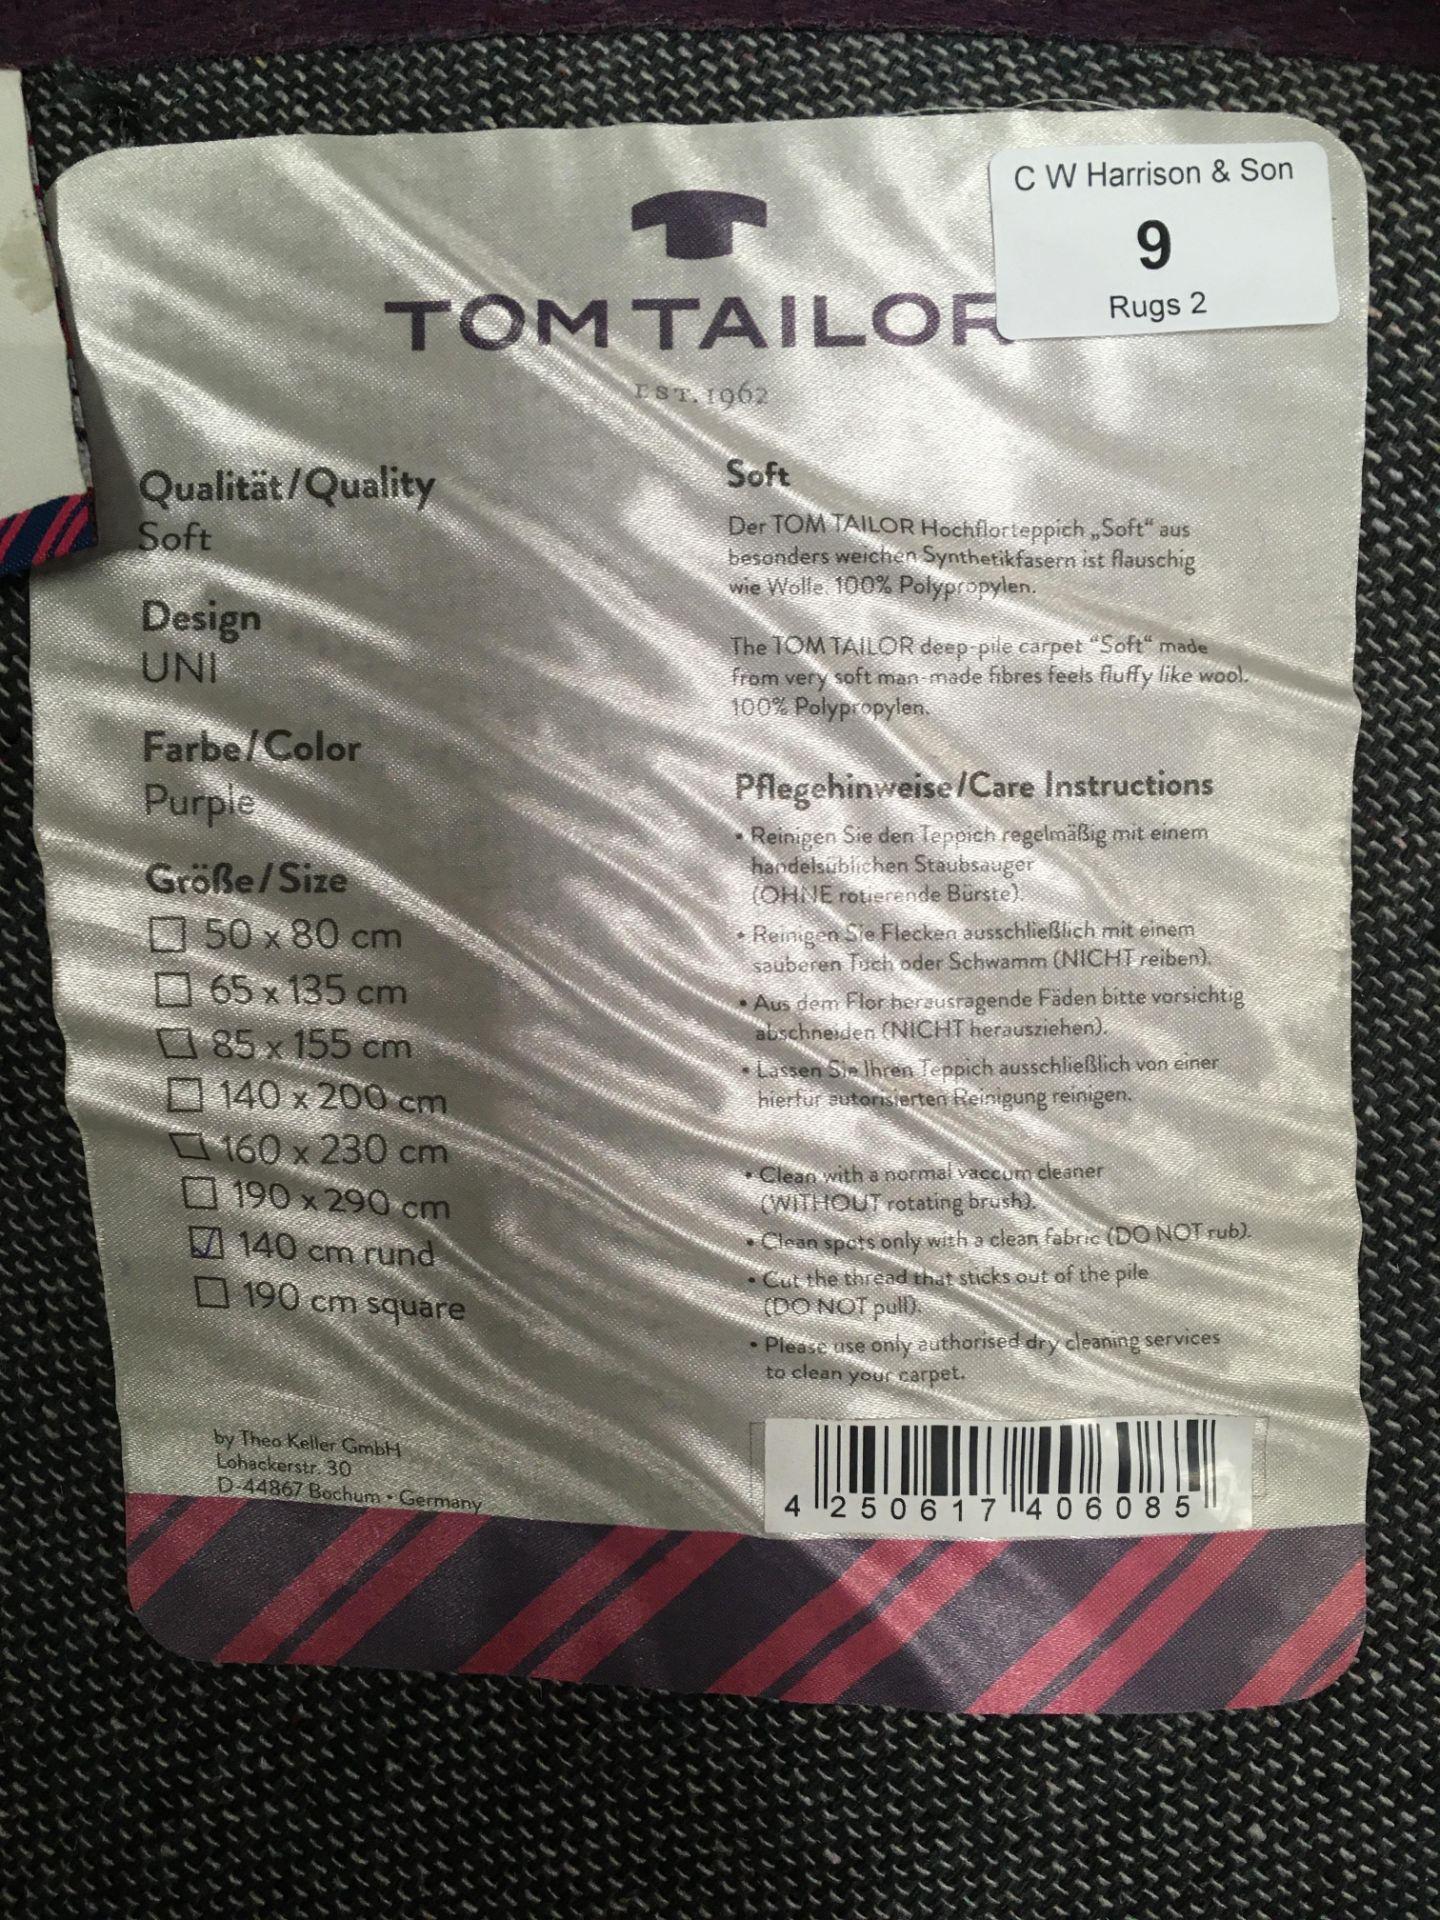 Lot 9 - A Tom Tailor Uni purple rug - 140cm round